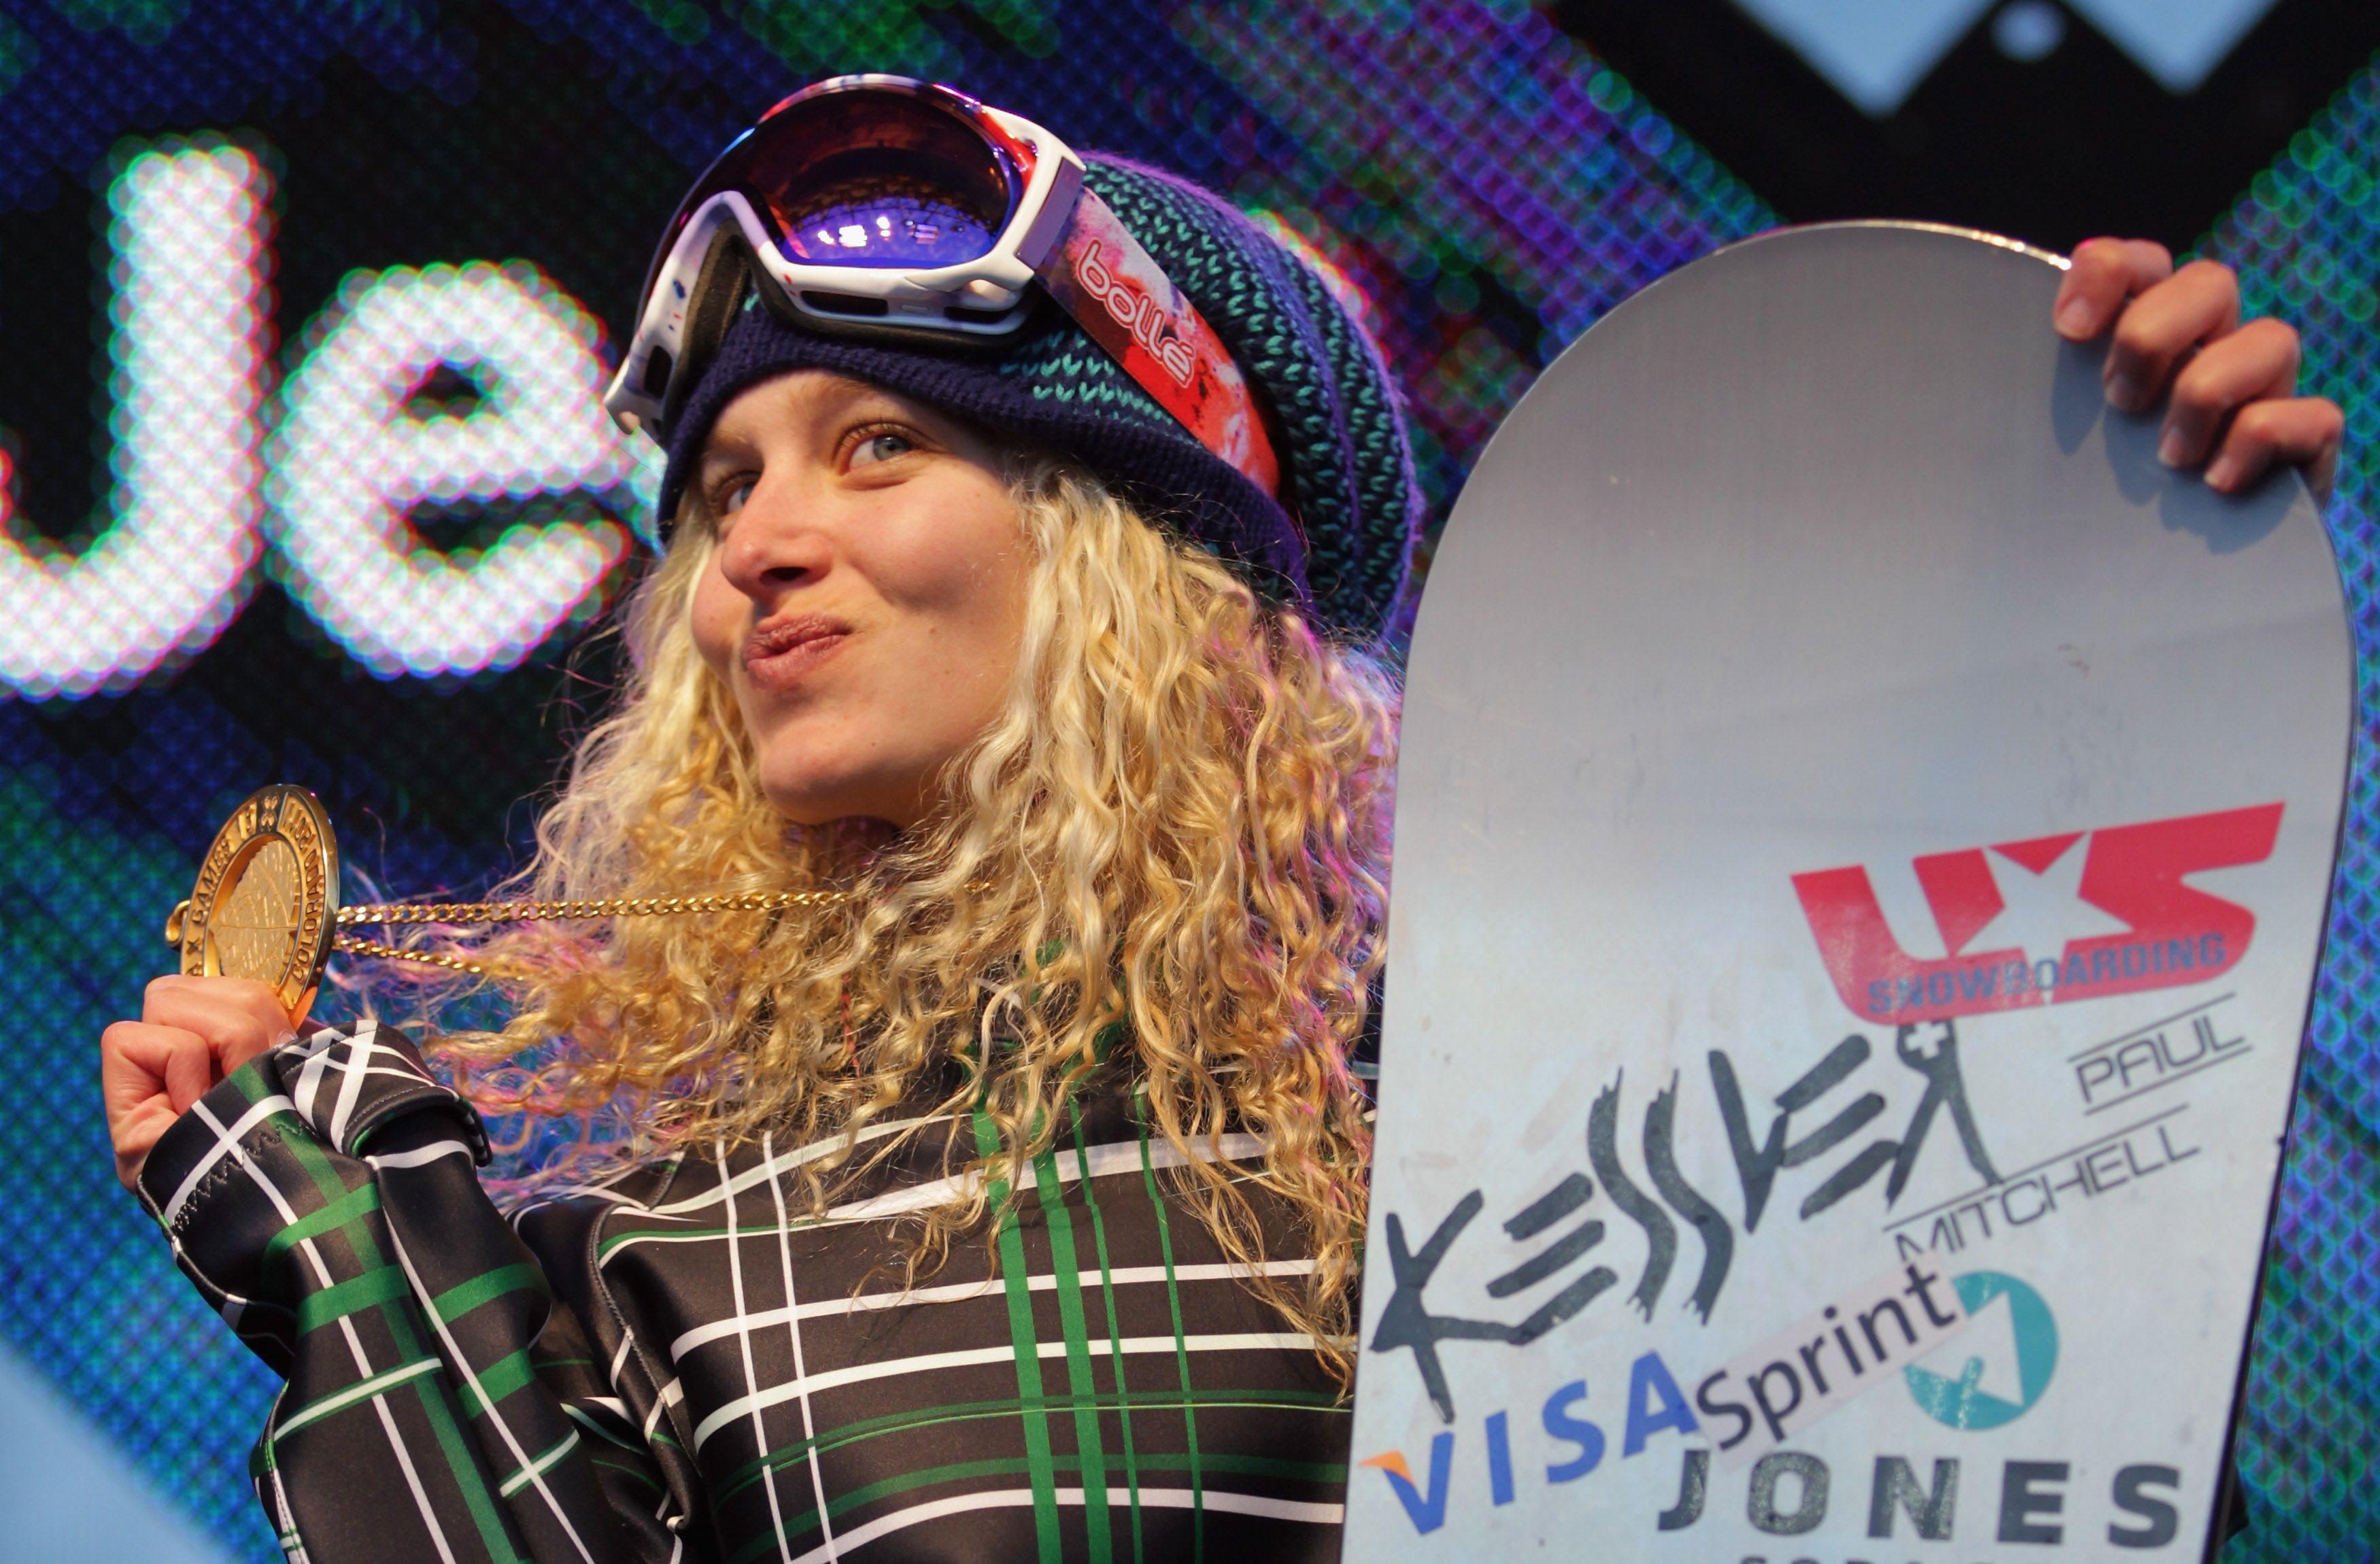 5. Lindsey Jacobellis - Snowboarder - Net Worth: $1 million